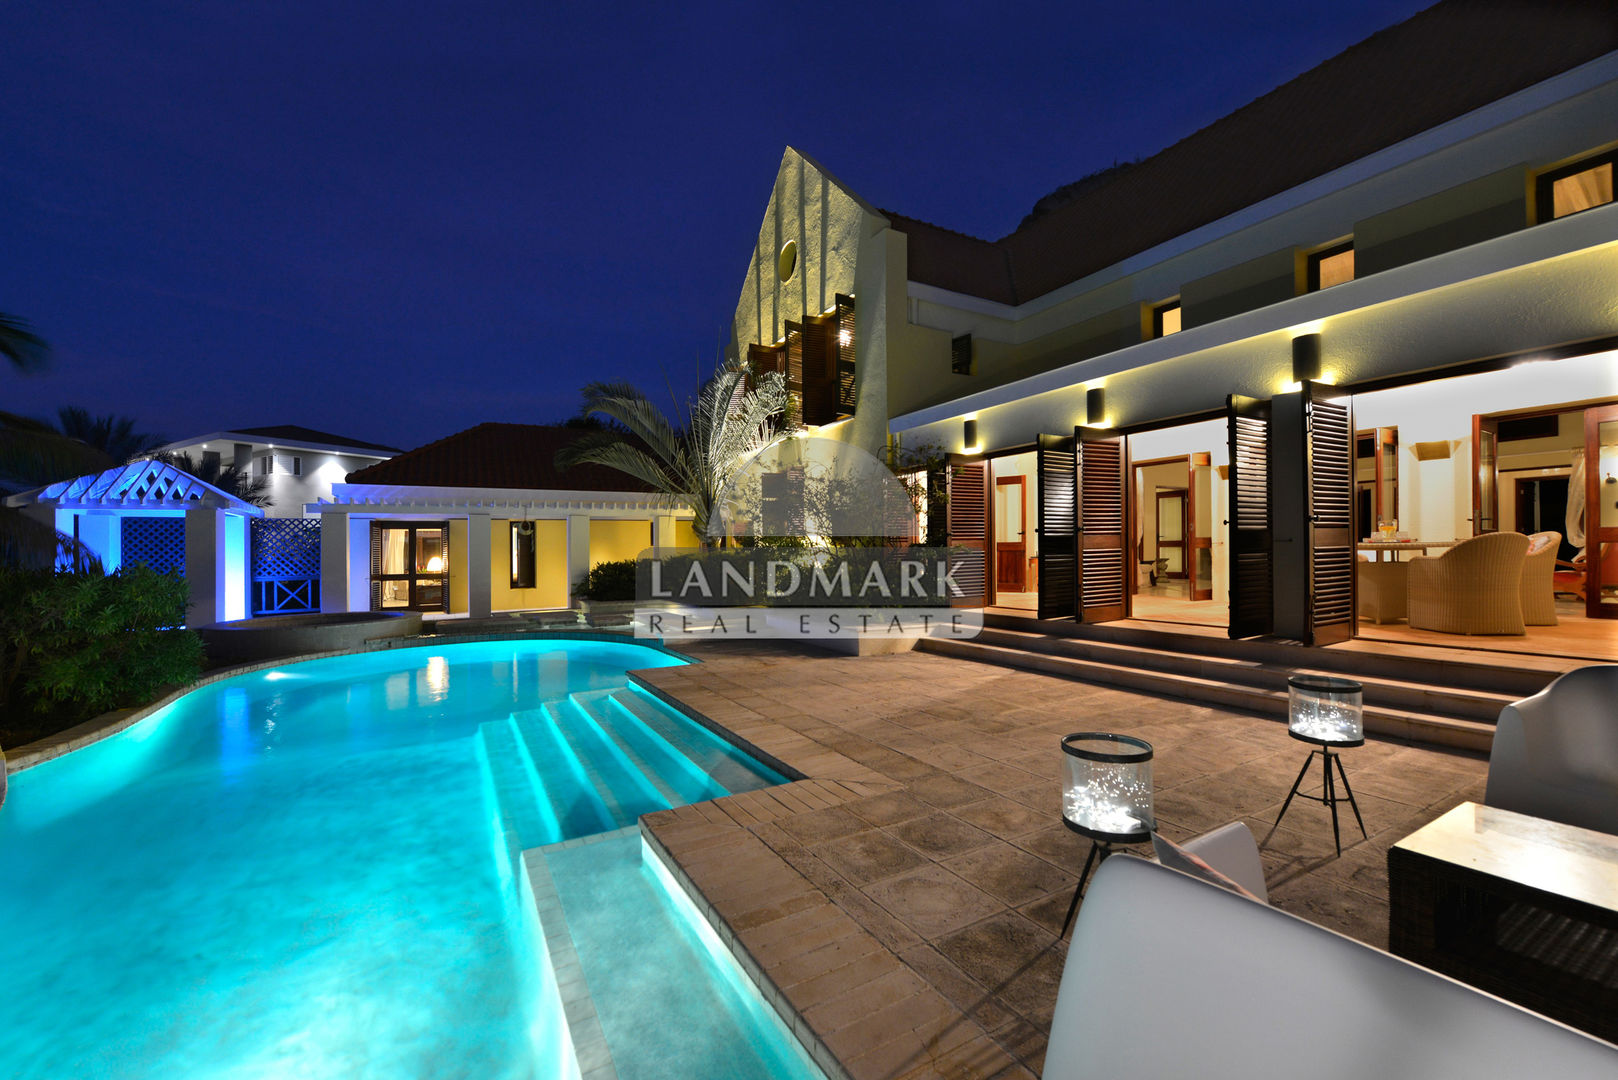 Seru Boca Estate 9, Santa Barbara Plantation foto-27